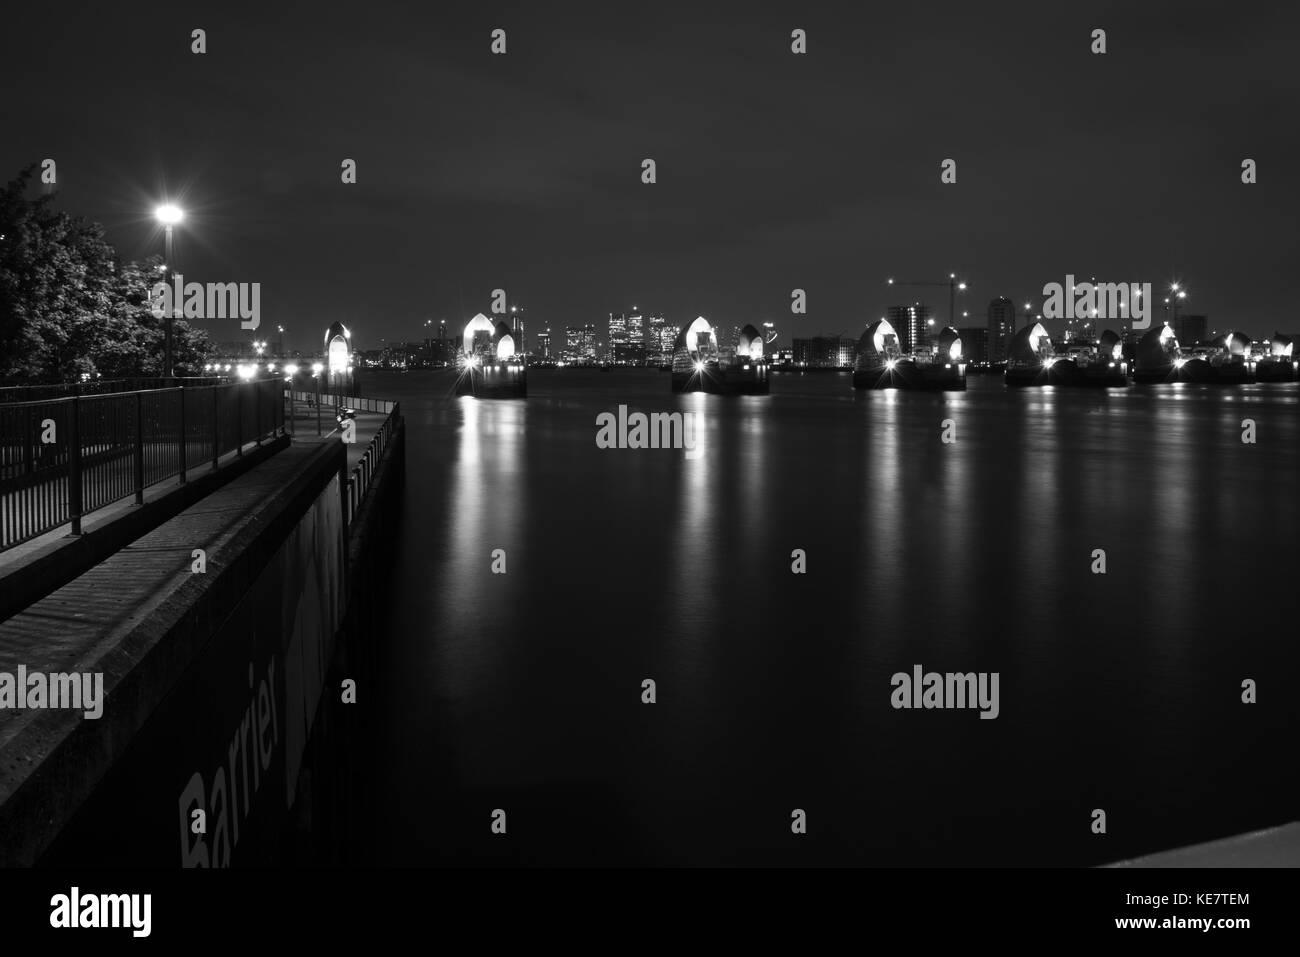 Thames Barrier - Stock Image